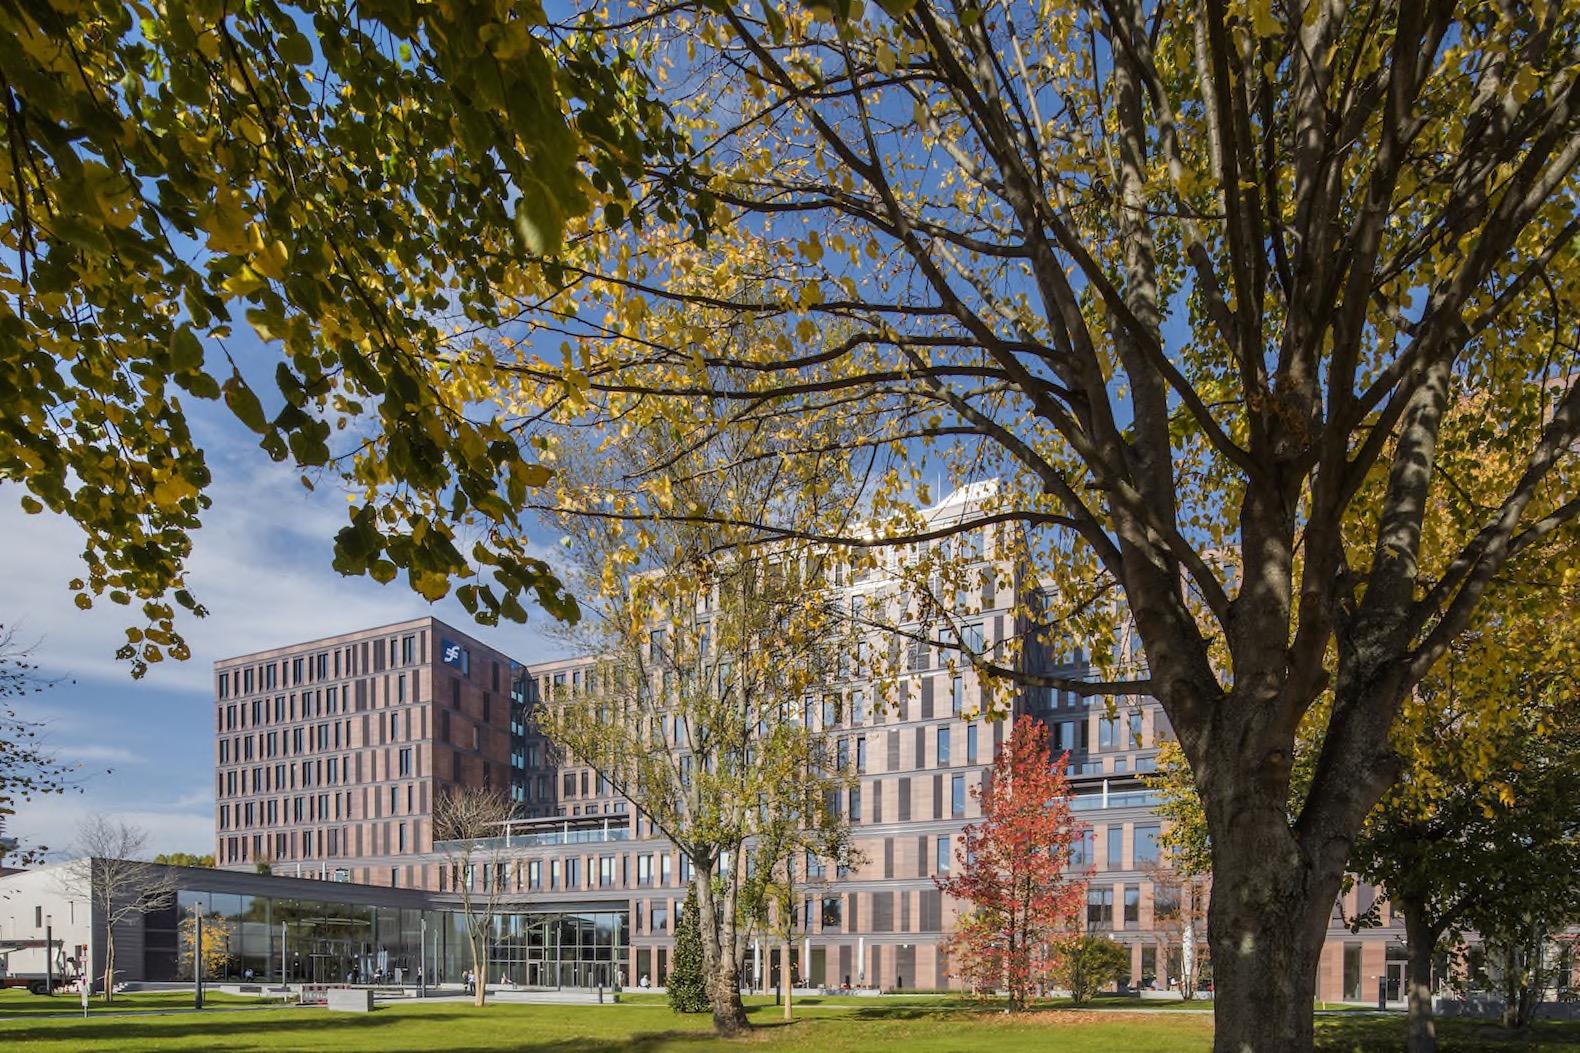 Foto: Henning Larsen Architects